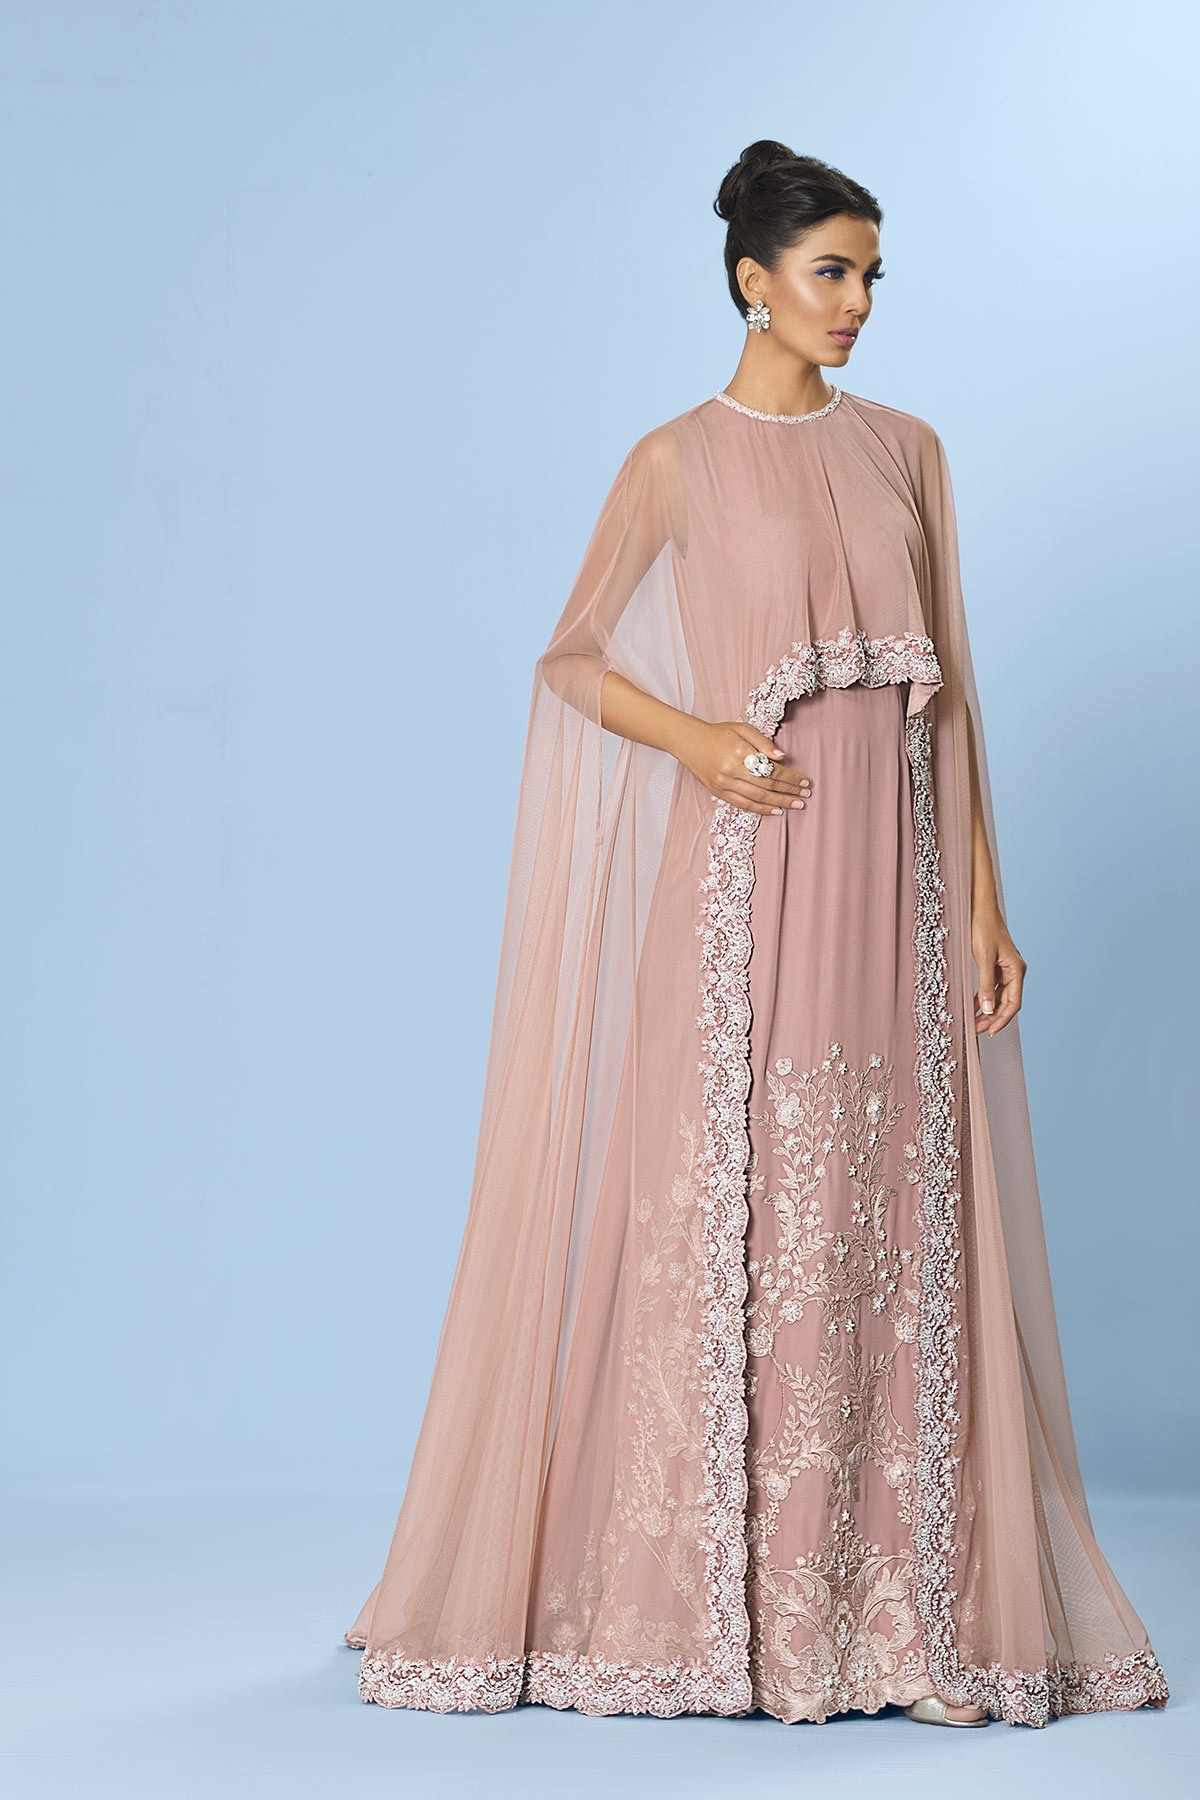 Crystal Cape Dress